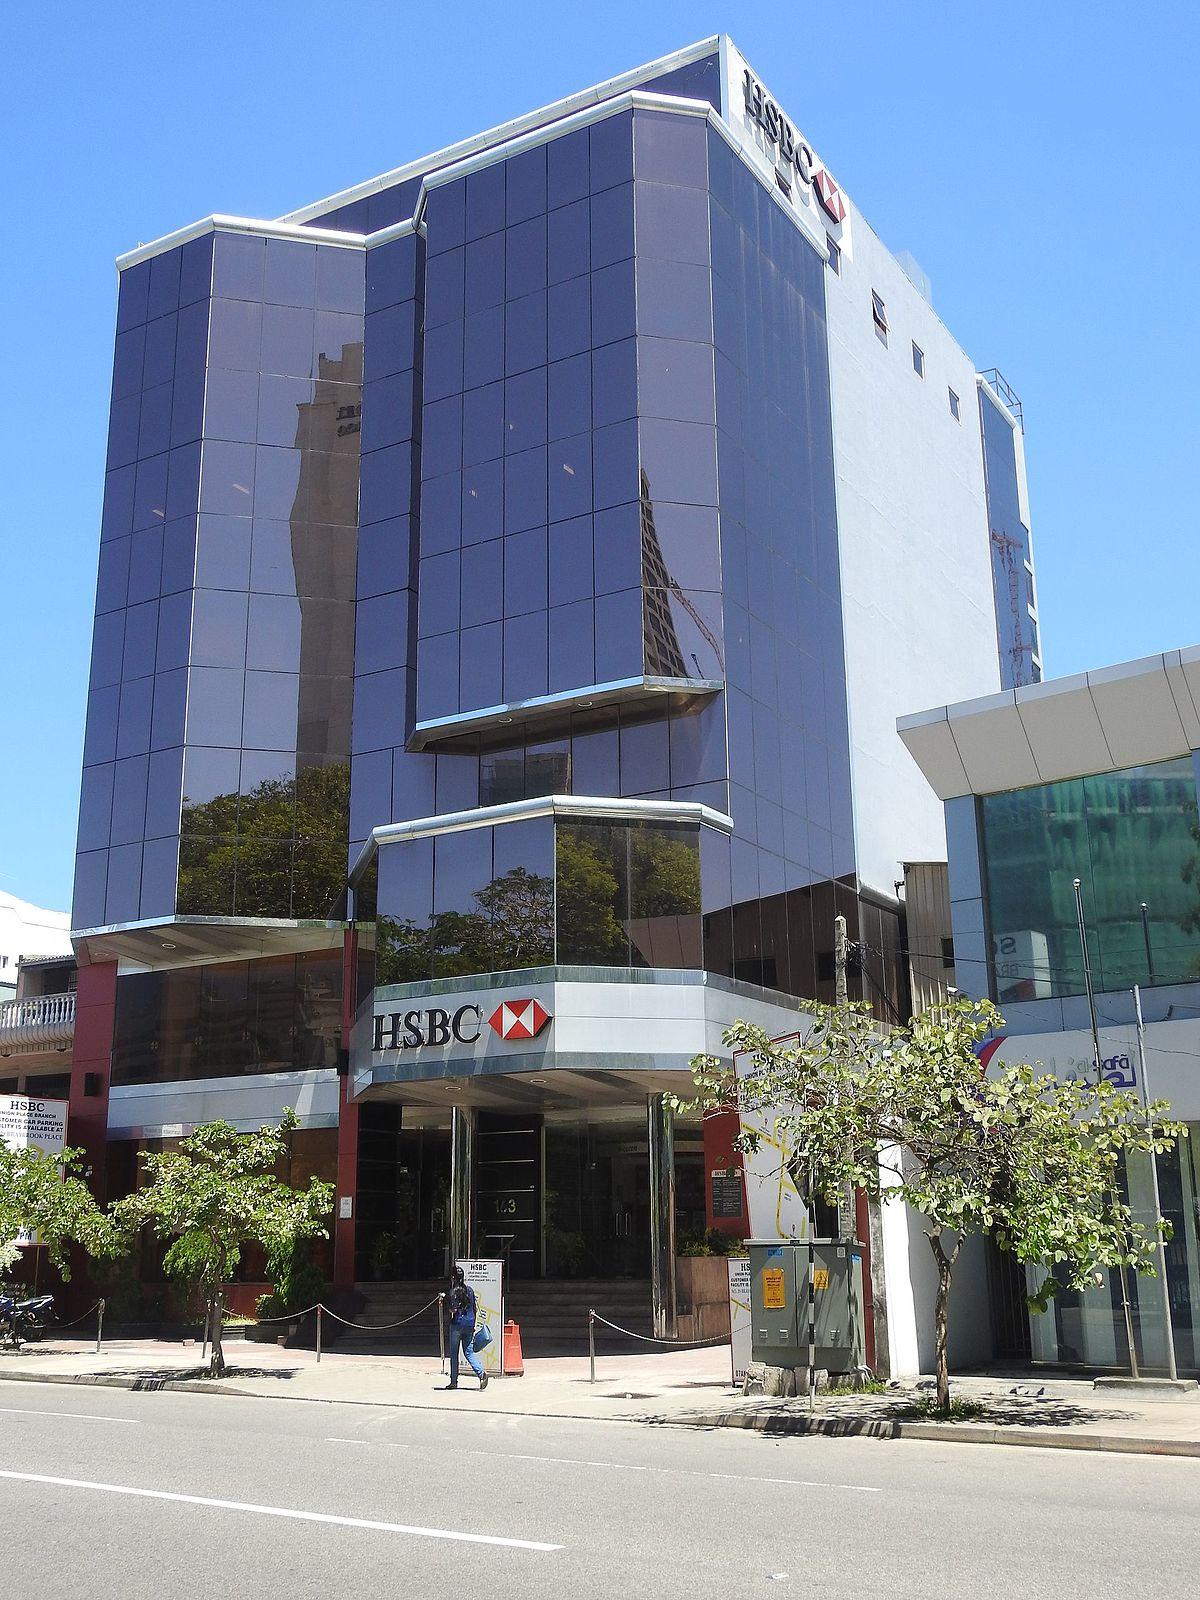 HSBC Sri Lanka - Wikipedia